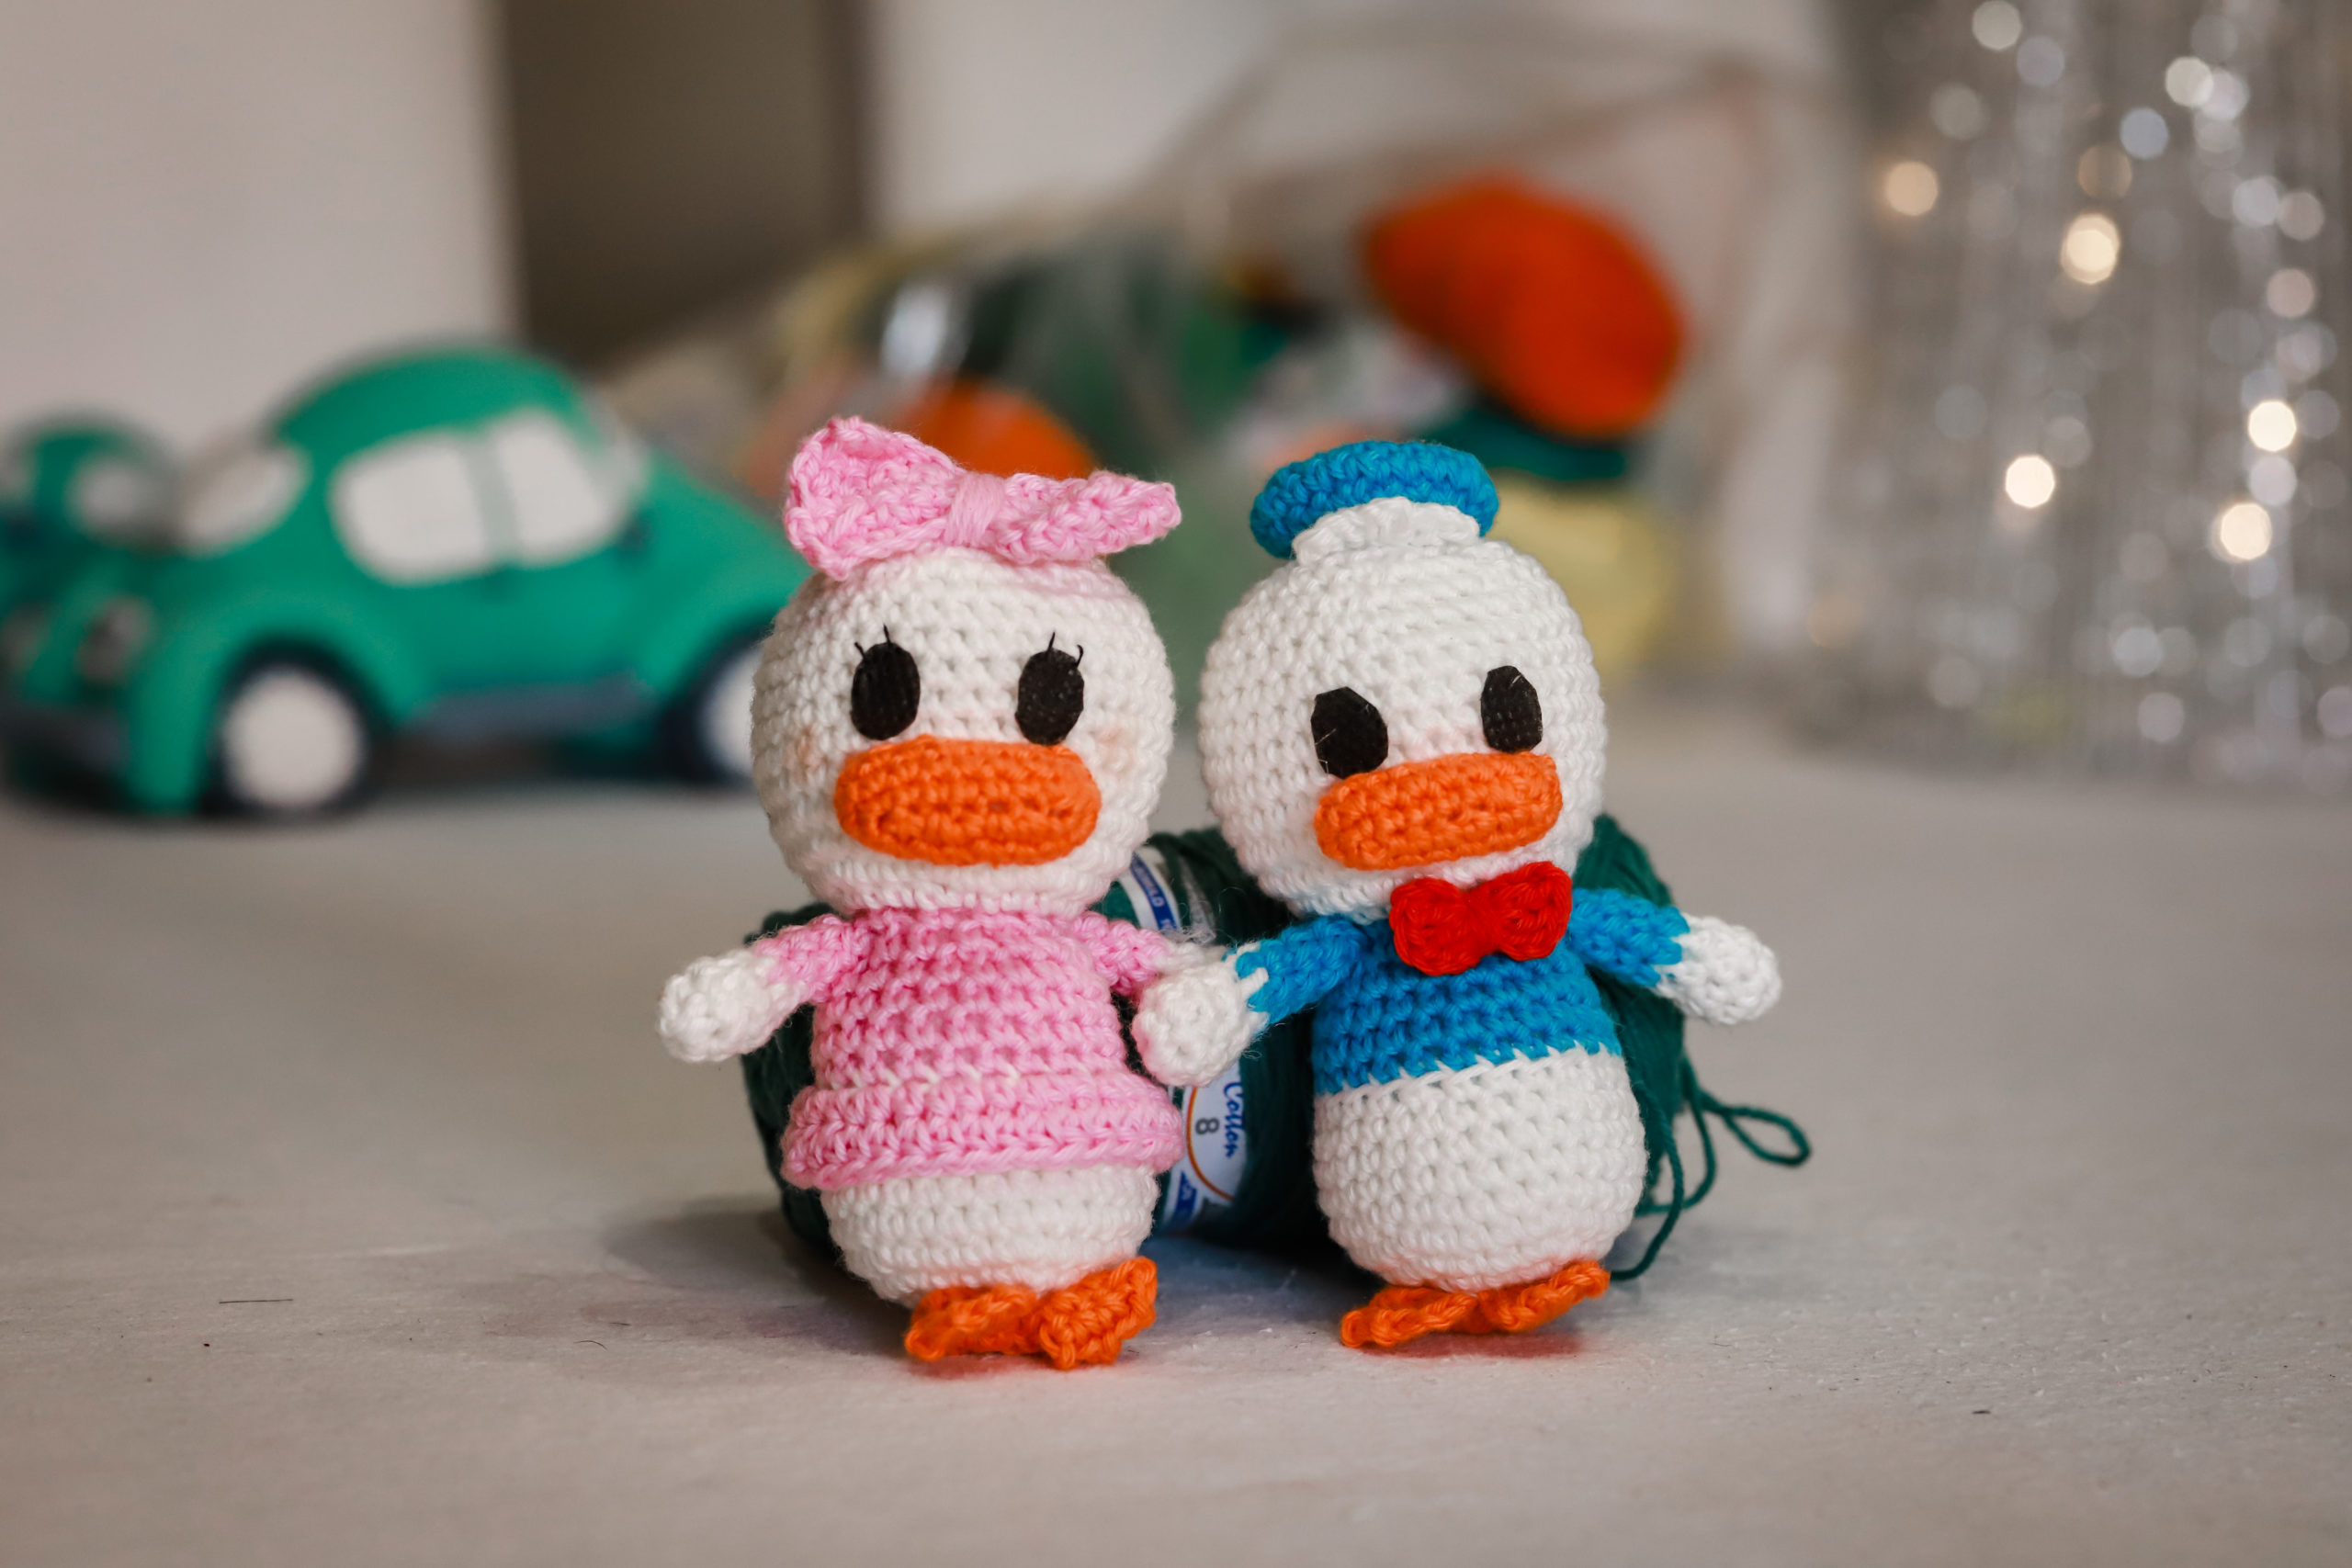 Fenicottero amigurumi uncinetto crochet - YouTube | 1707x2560